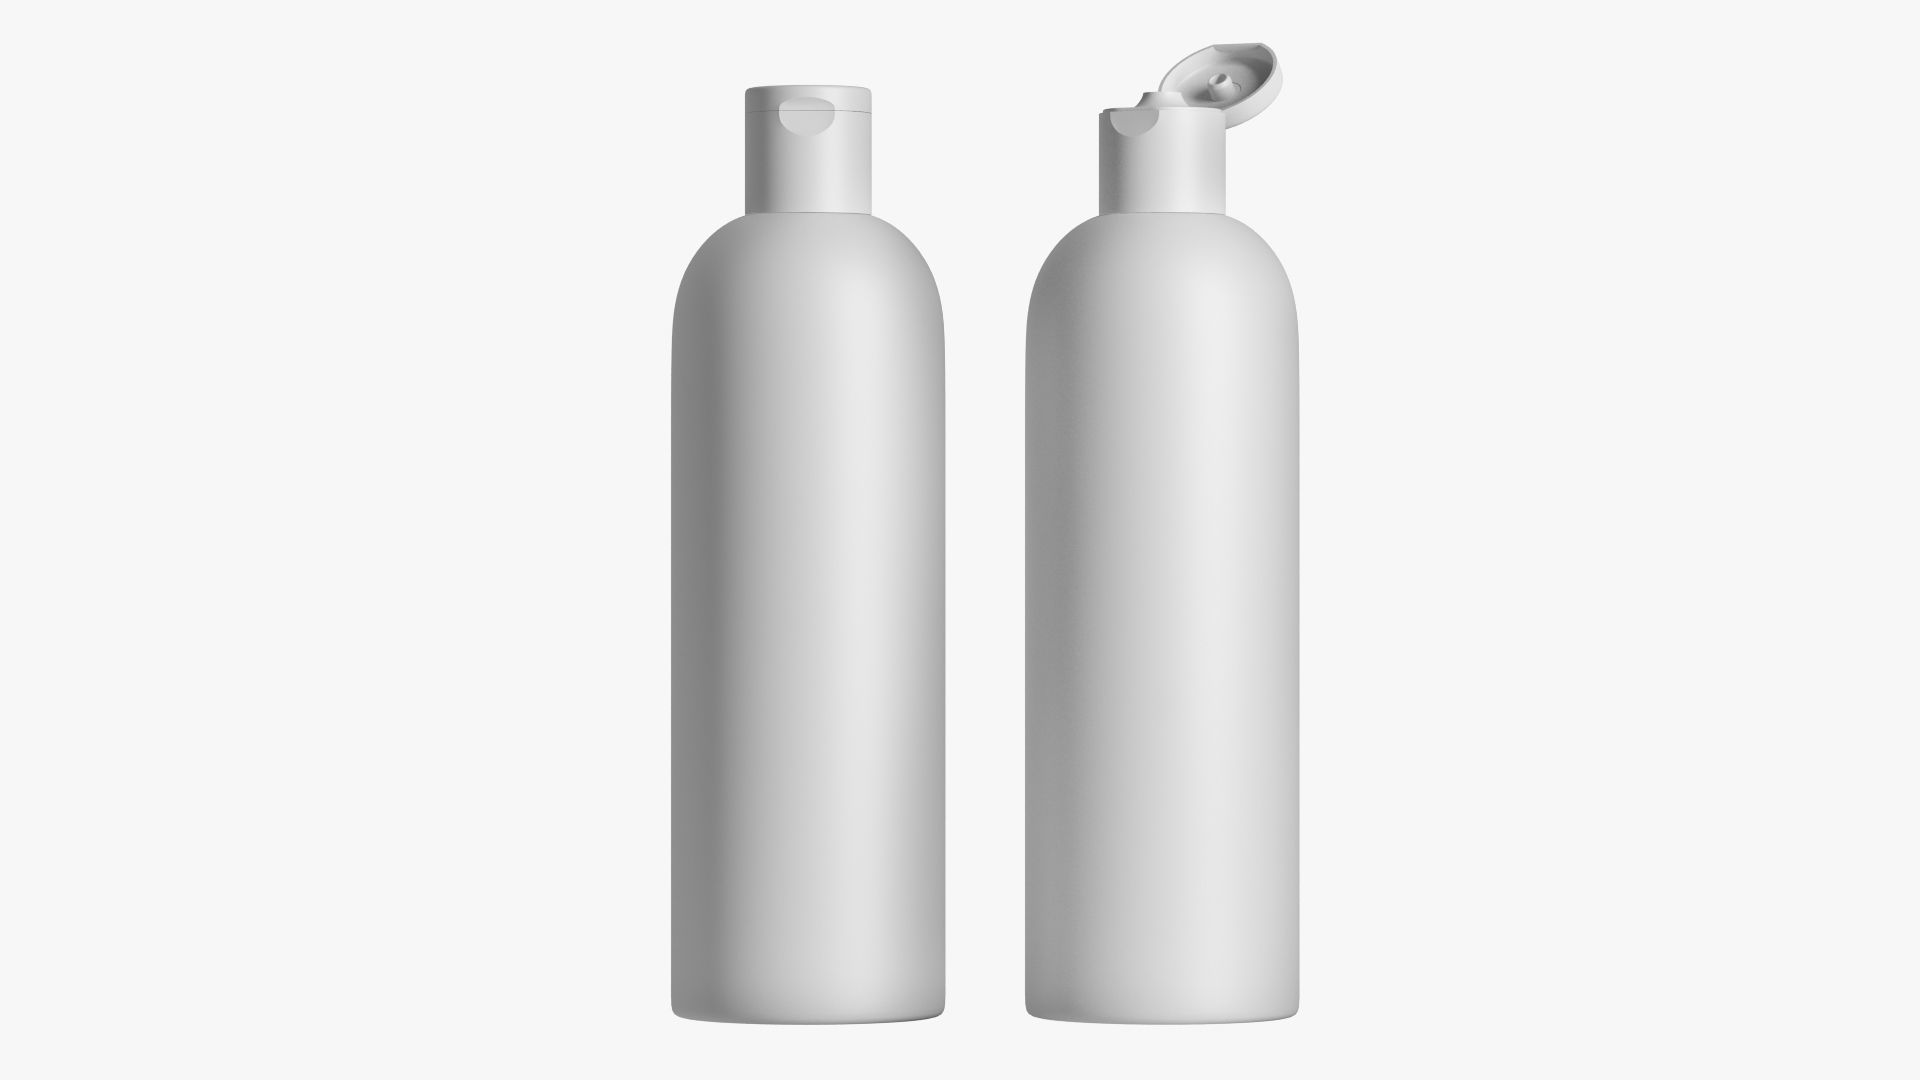 Shampoo Bottle 01